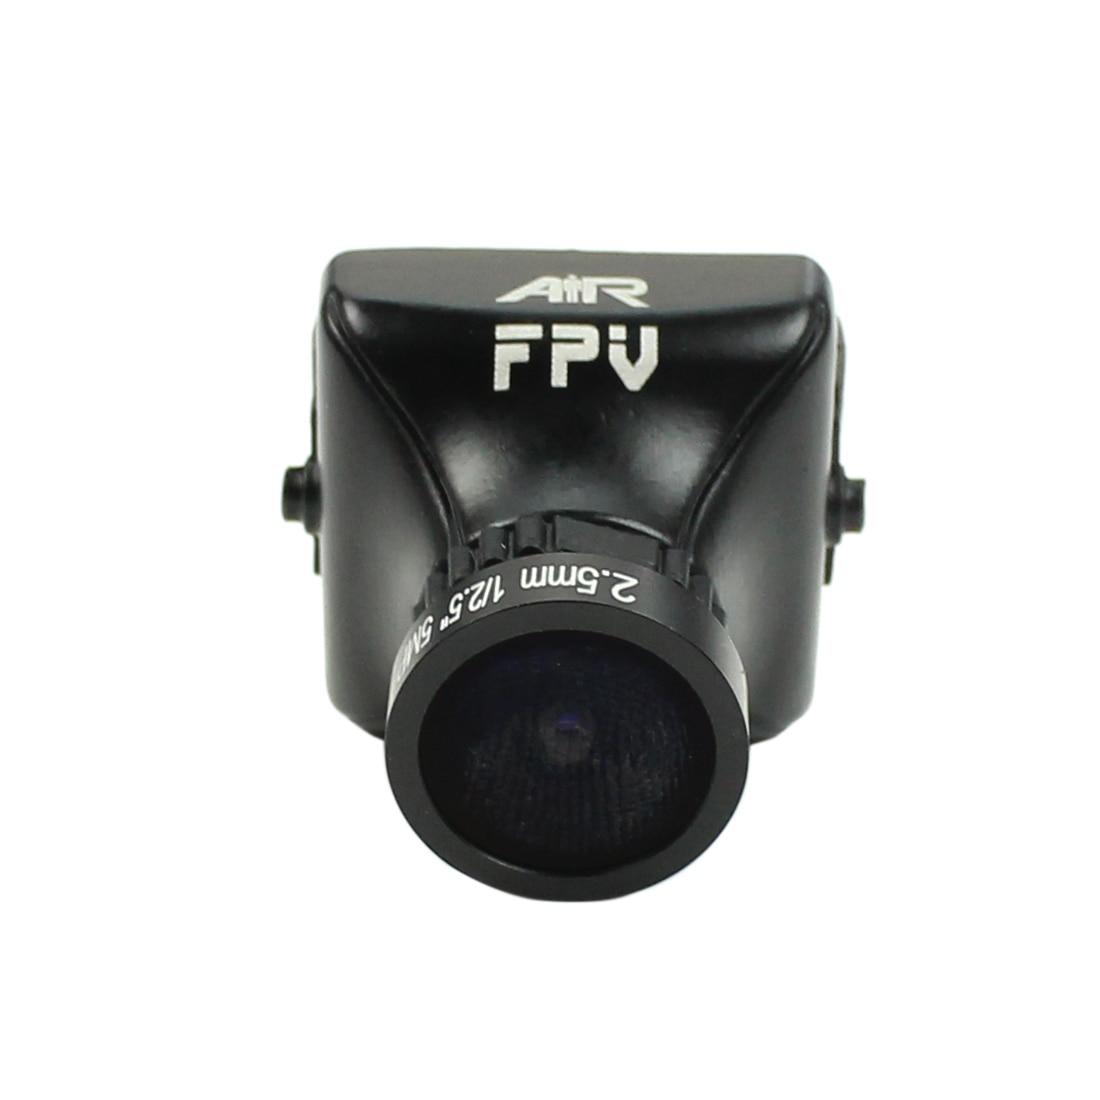 Pro Mini FPV Camera 800TVL CCD 1080P HD Cam 2.1mm 2.5mm Lens OSD DC 4.7V-22V PAL/NTSC Switchable Camera For RC Drone Quadcopter